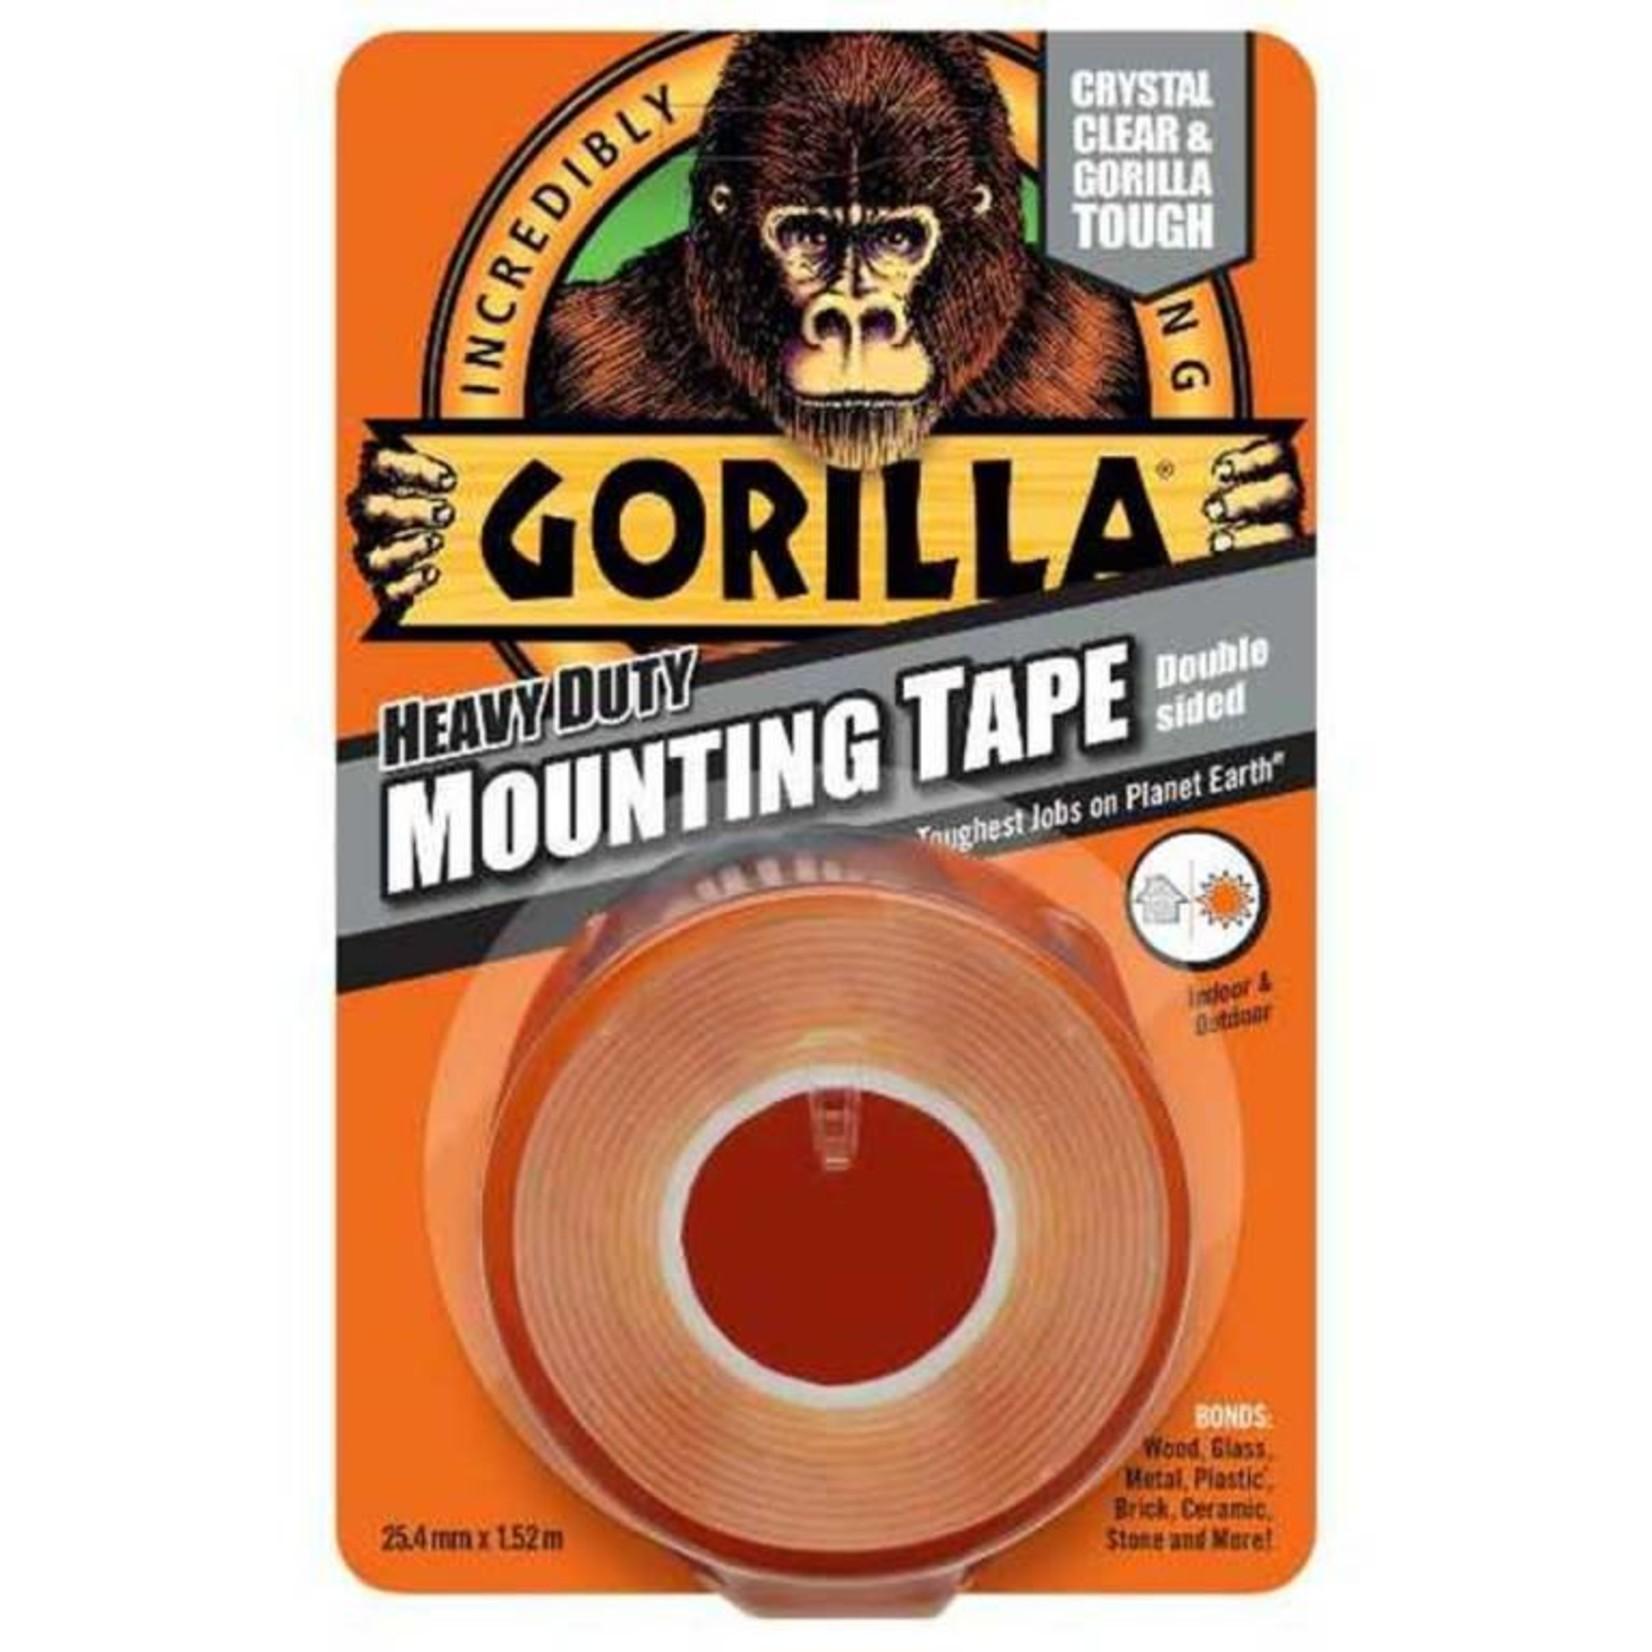 Gorilla GORILLA MOUNTING TAPE 1.5M CLEAR